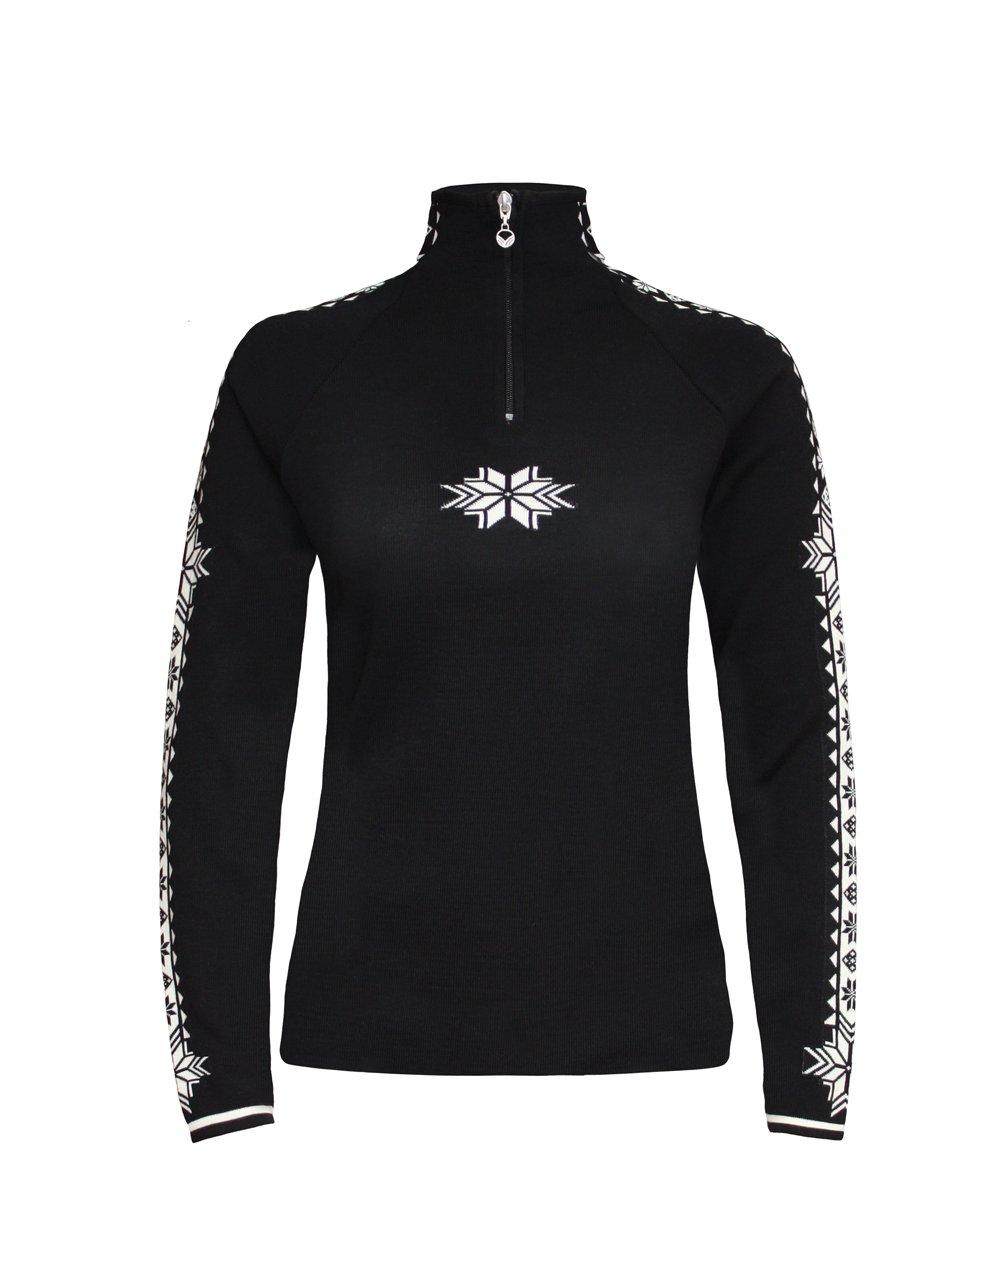 Dale of Norway Women's Geilo Sweater, Black/Off White, Medium